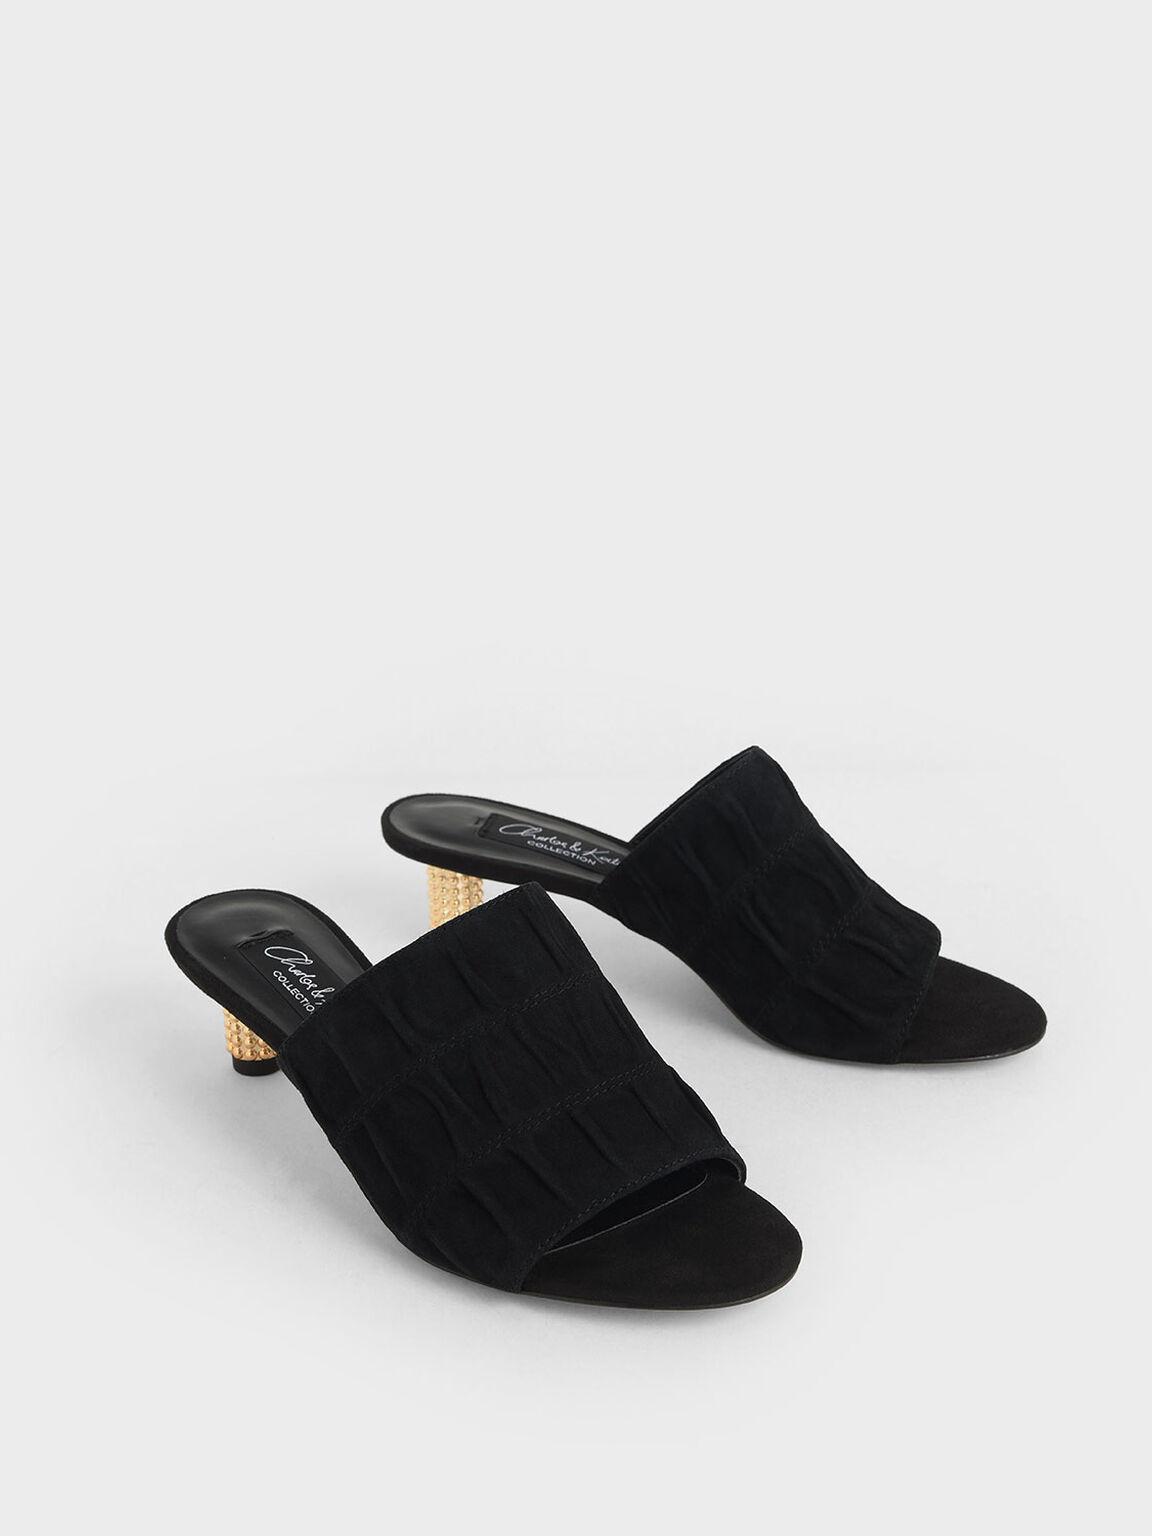 Embellished Heel Ruched Mules (Kid Suede), Black, hi-res